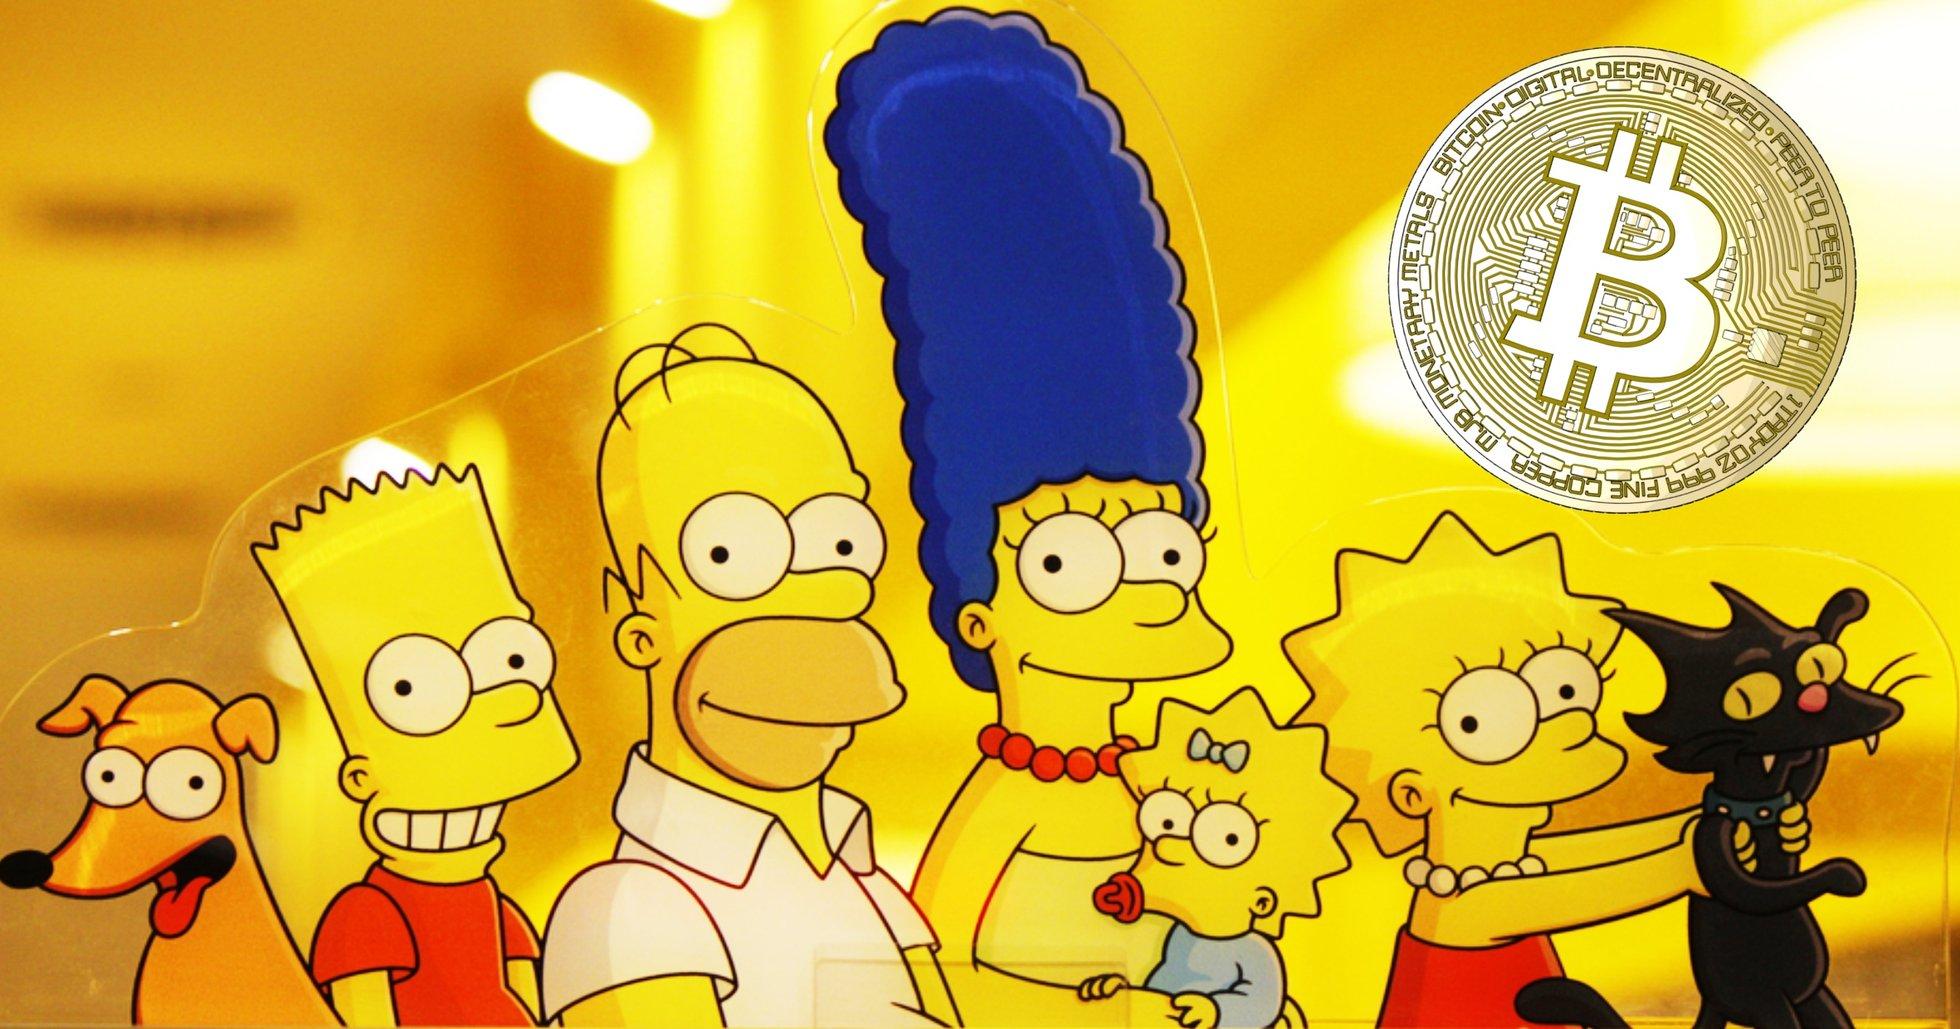 Senaste avsnittet av The Simpsons handlar om kryptovalutor: